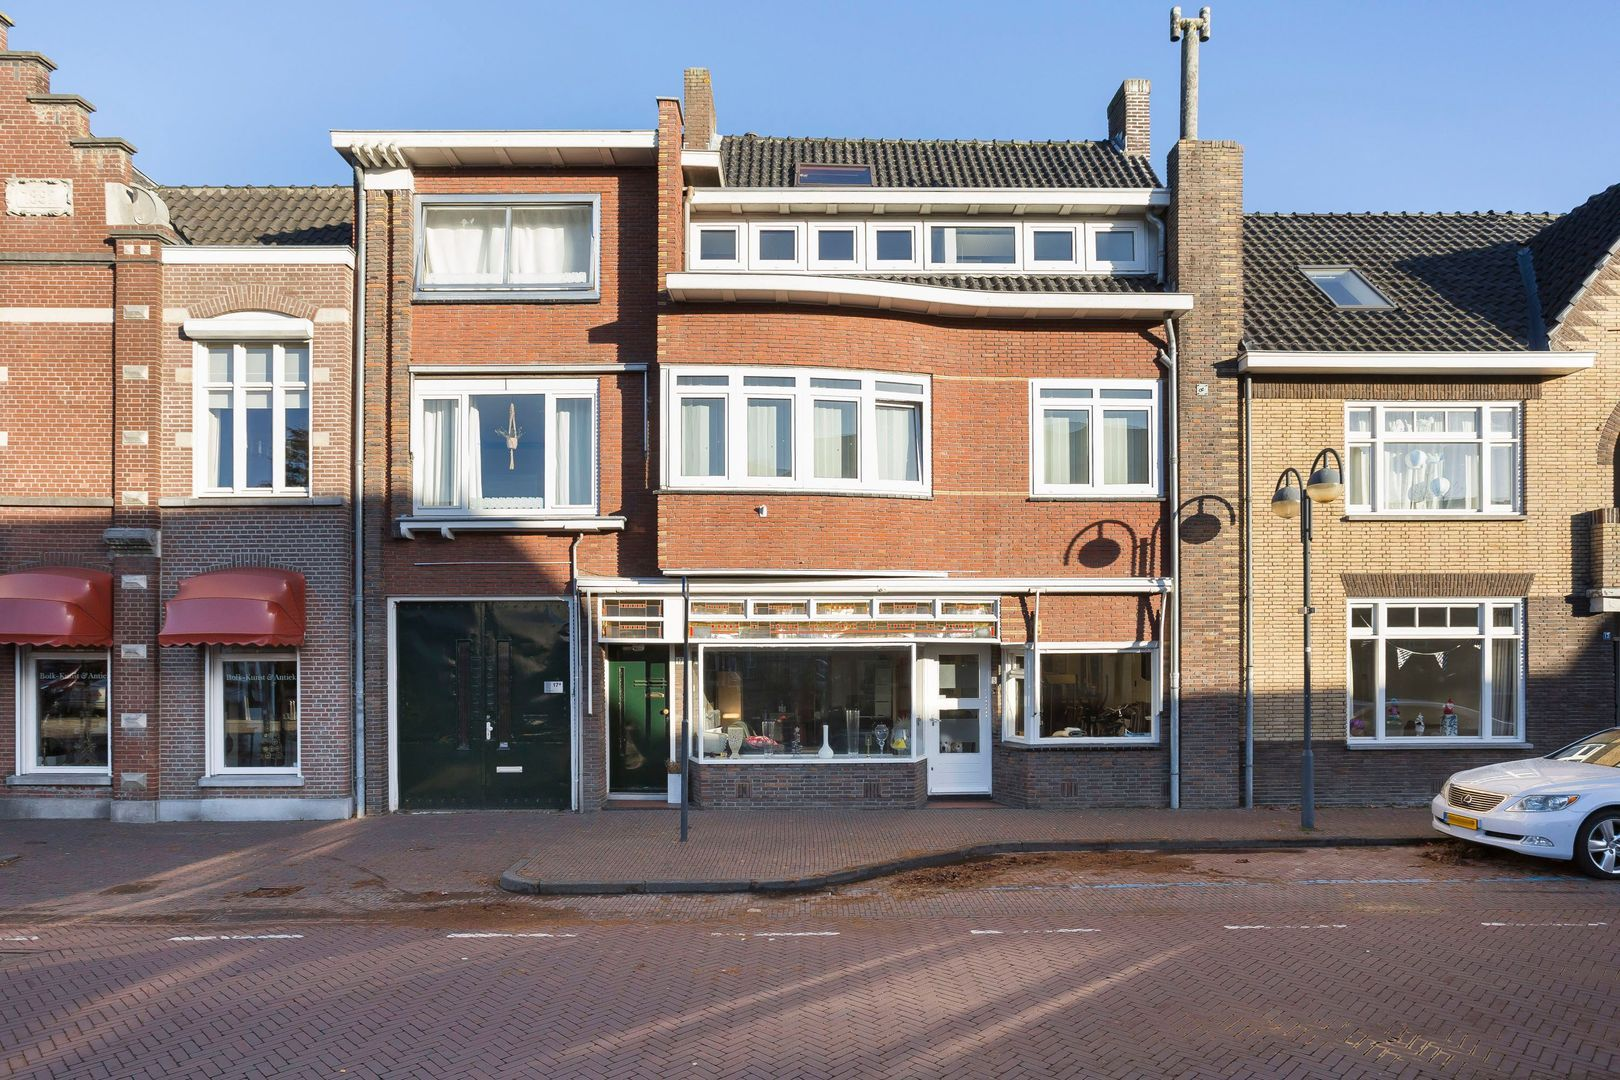 Tilburgseweg 15, 17, 17 a 0 ong, Goirle foto-